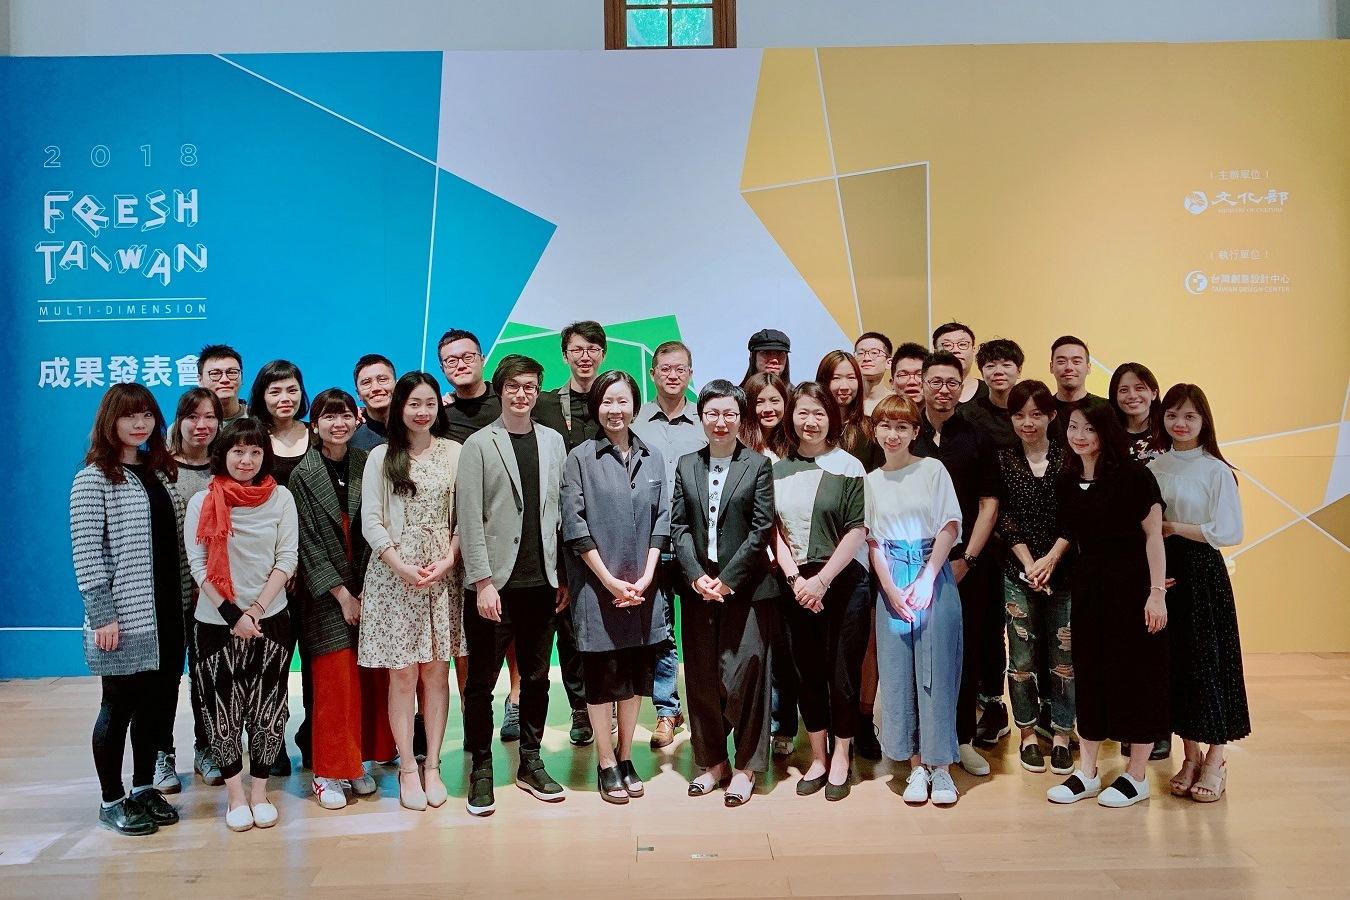 Fresh Taiwan國家品牌 站穩全球文創市場